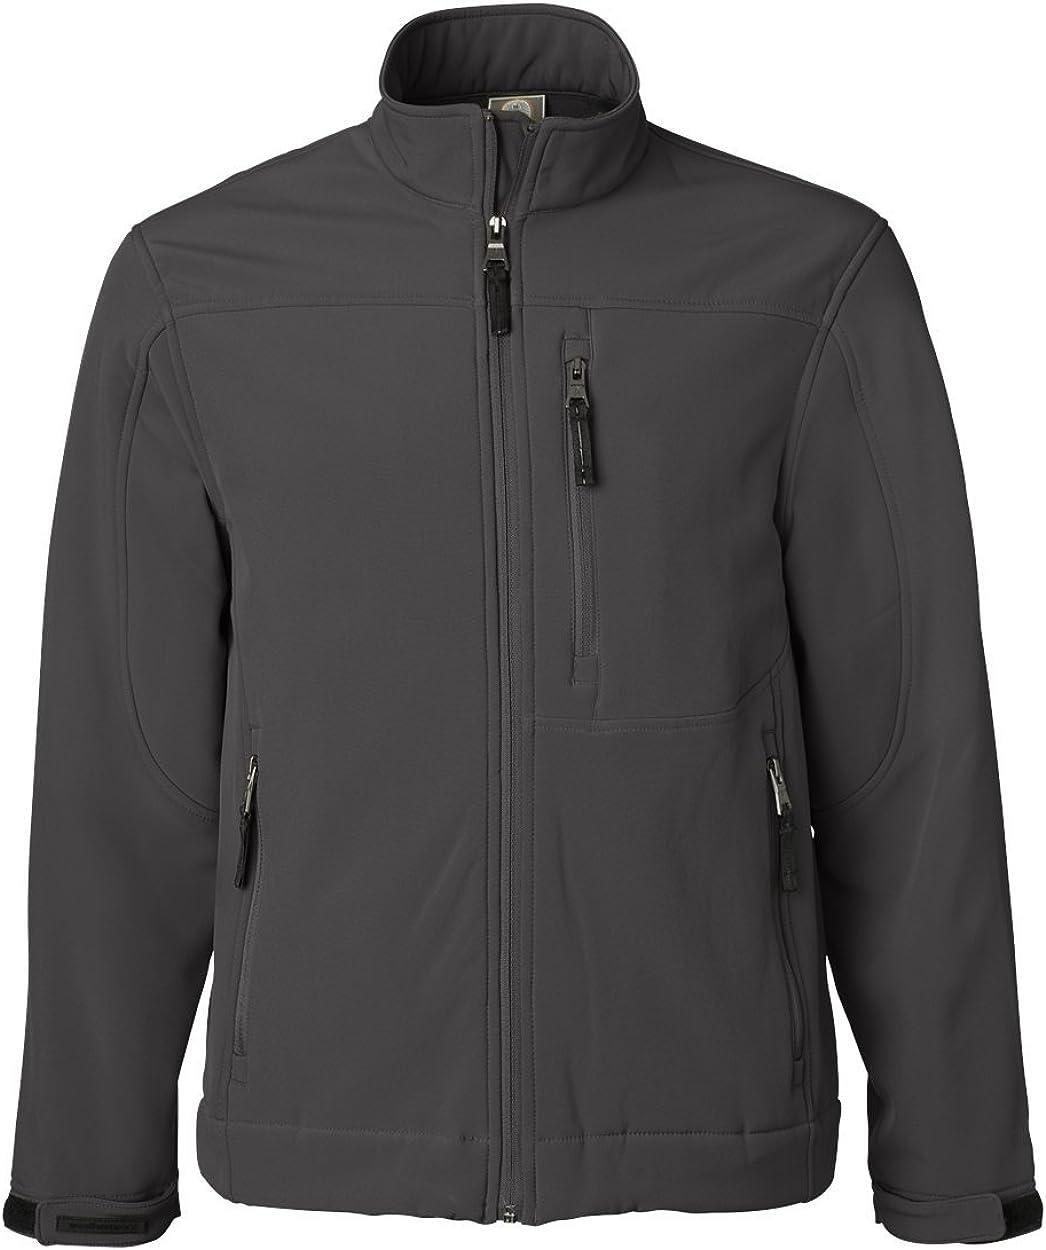 Weatherproof Brand new - Soft 6500 Free Shipping Cheap Bargain Gift Shell Jacket